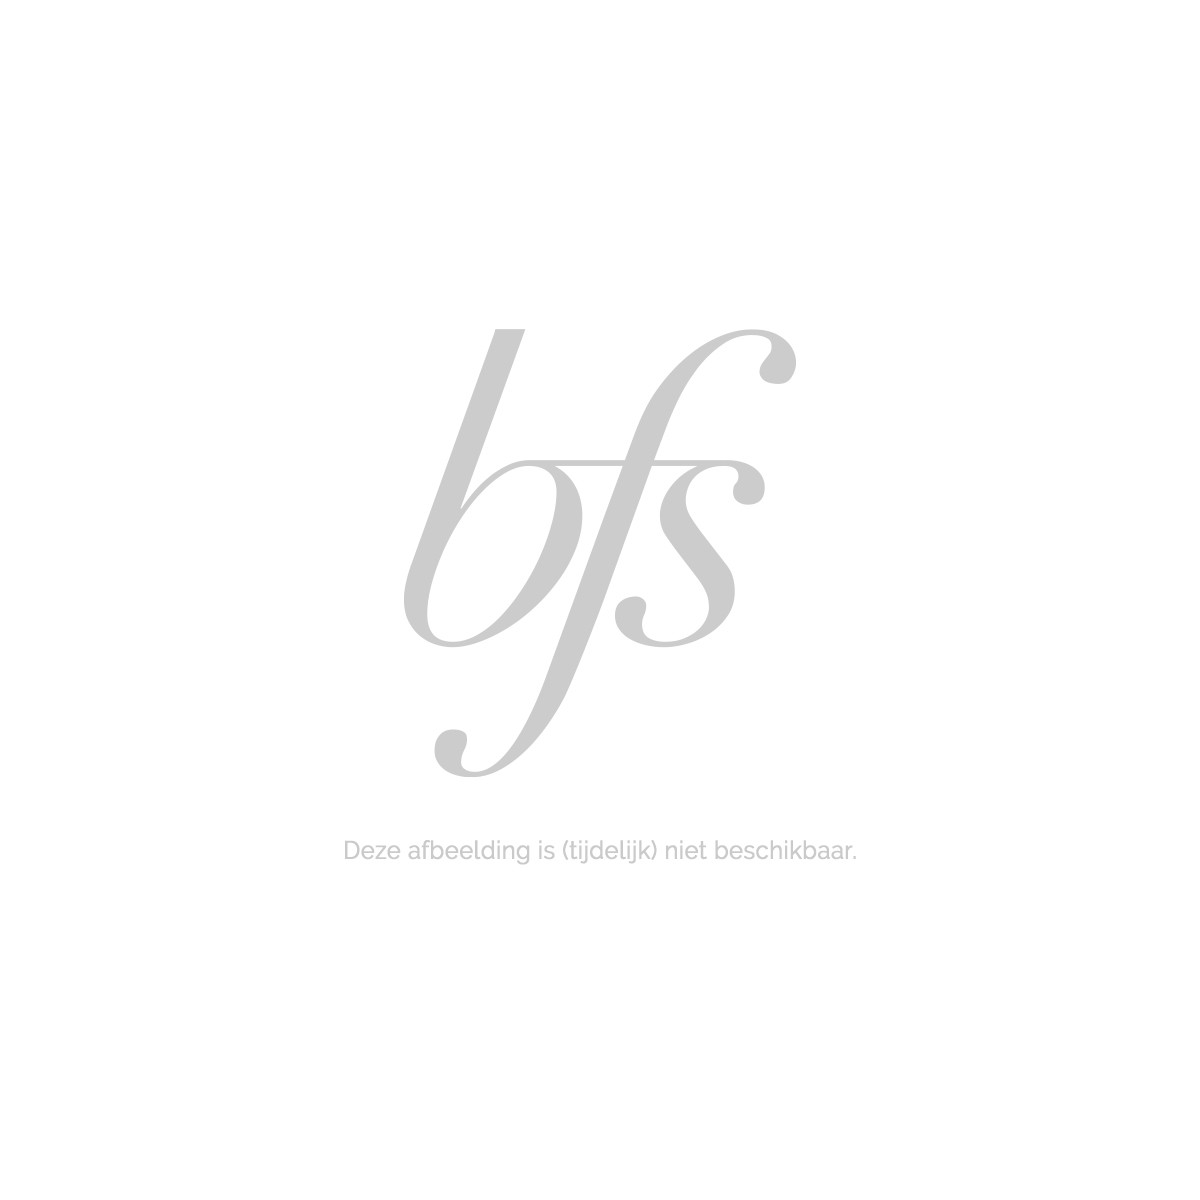 Beardburys Baard En Snorwax 50 Ml